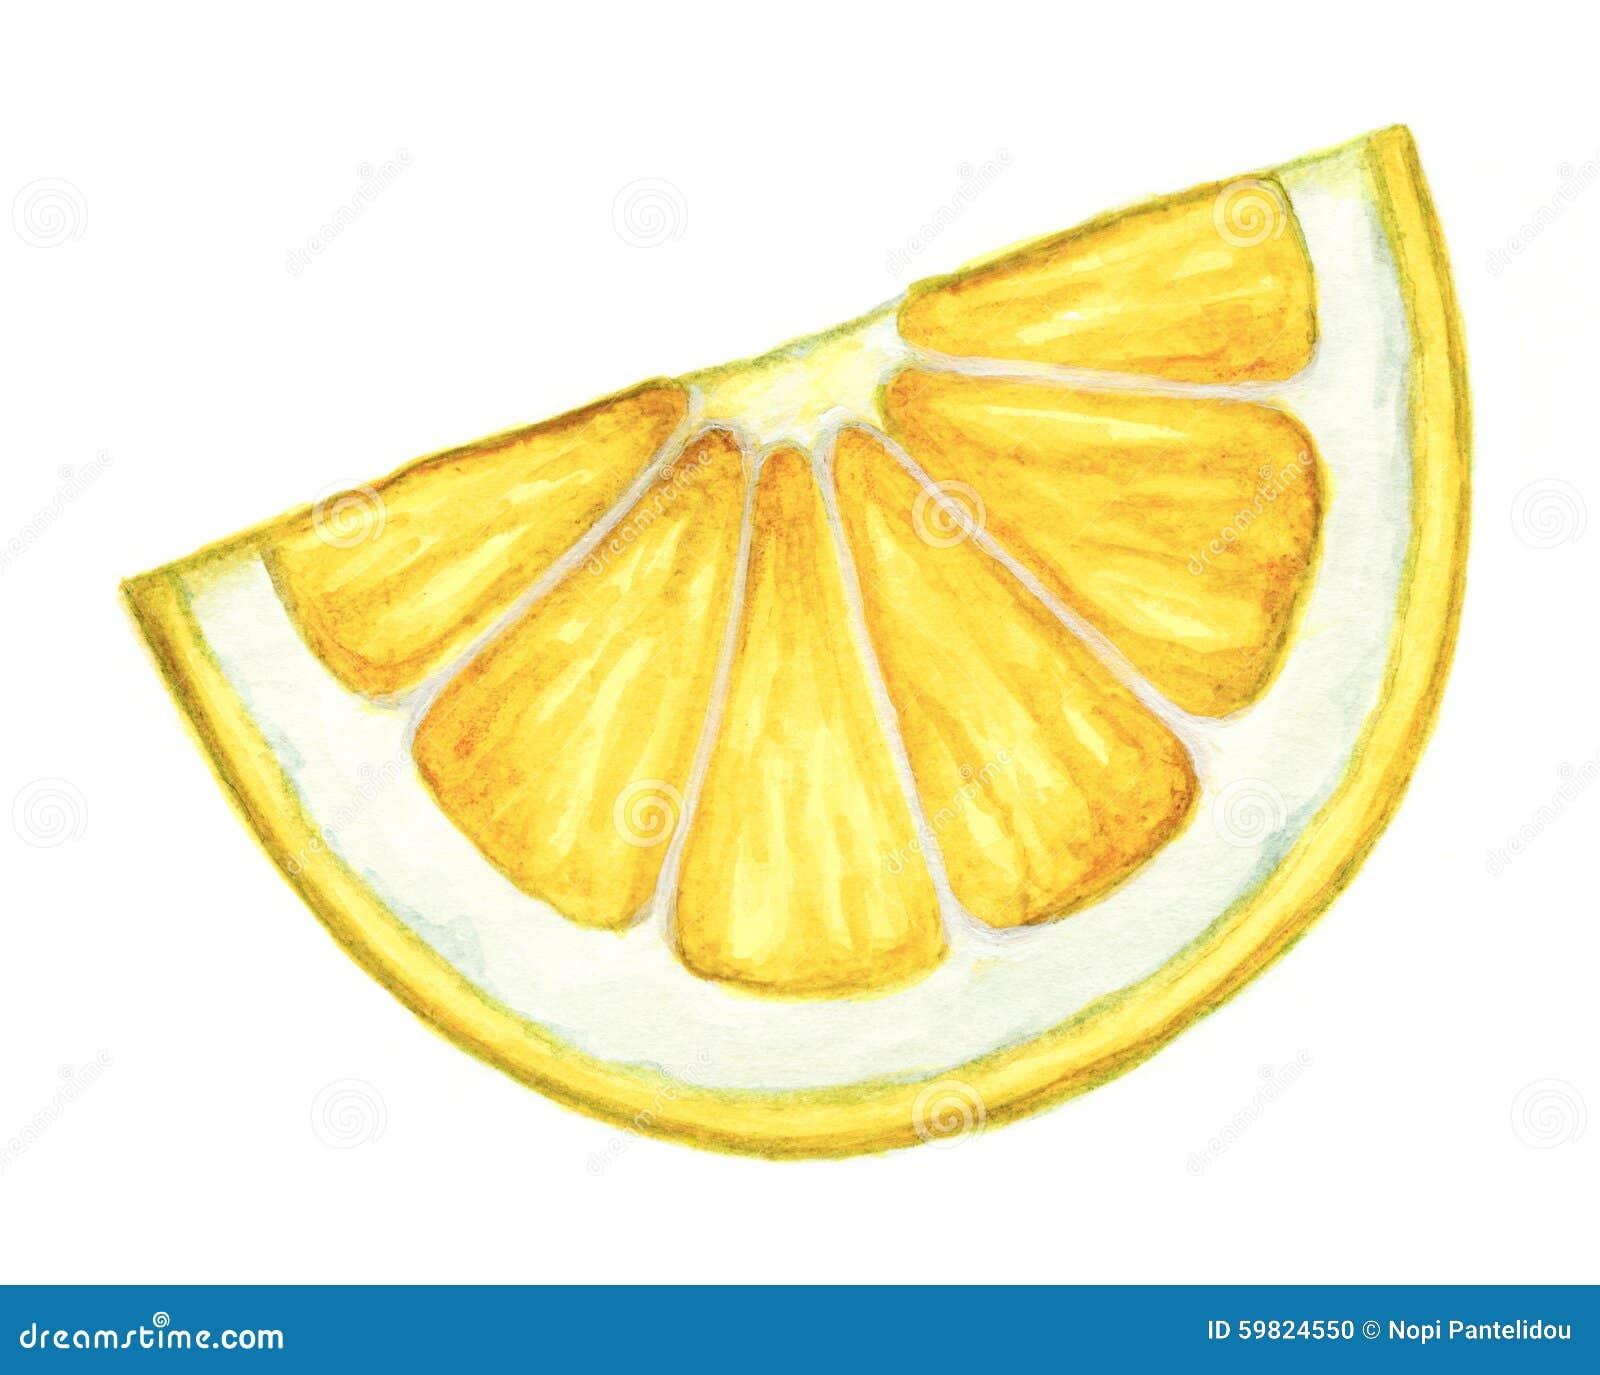 Watercolor Lemon Slice On White Background. Stock Illustration - Image ...